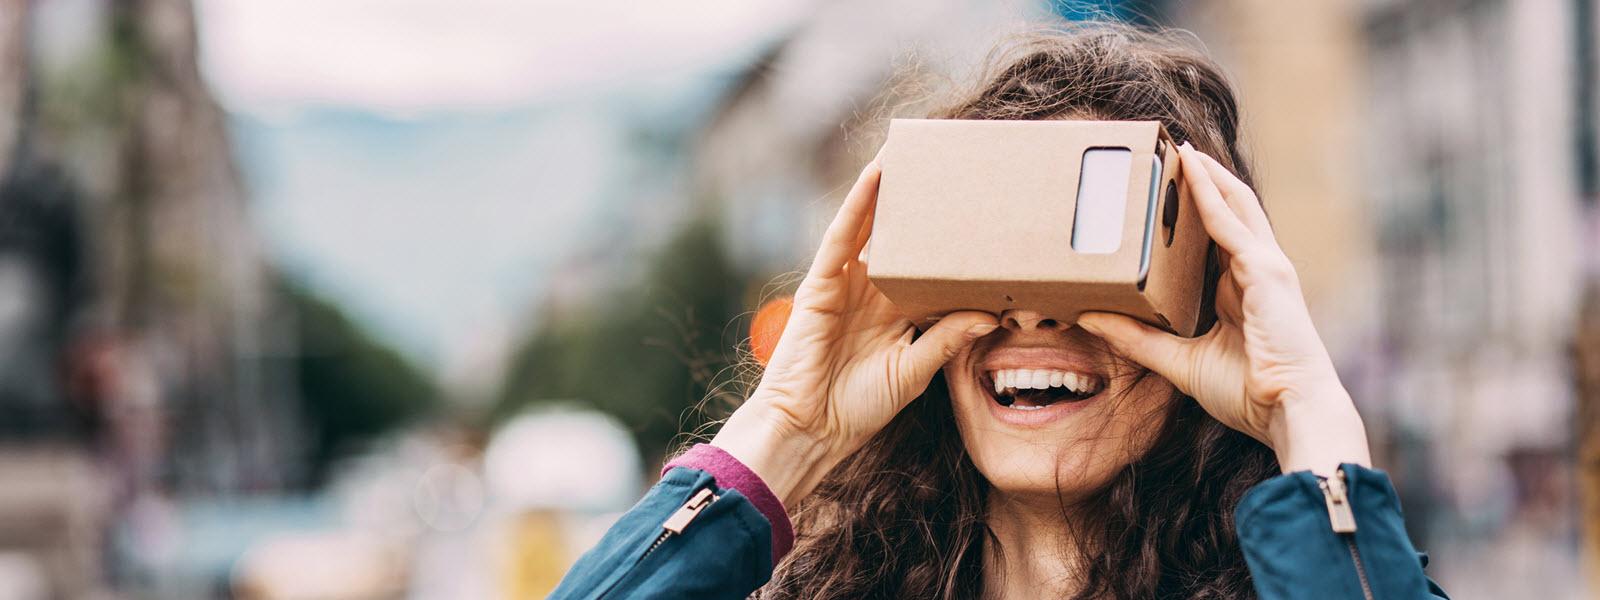 augmented reality, virtual reality, AR, VR